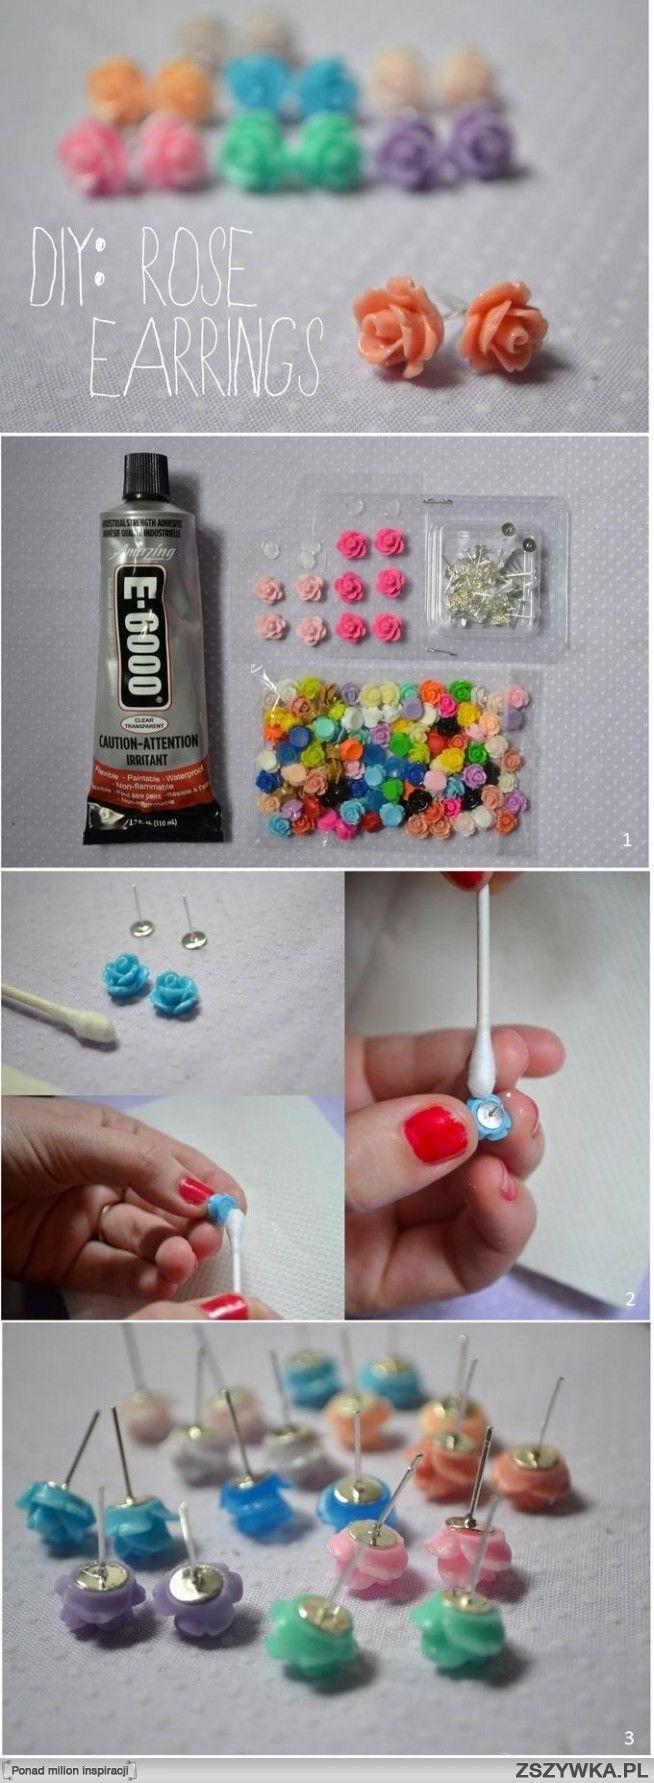 DIY rose earrings. SO CUTE AHH.